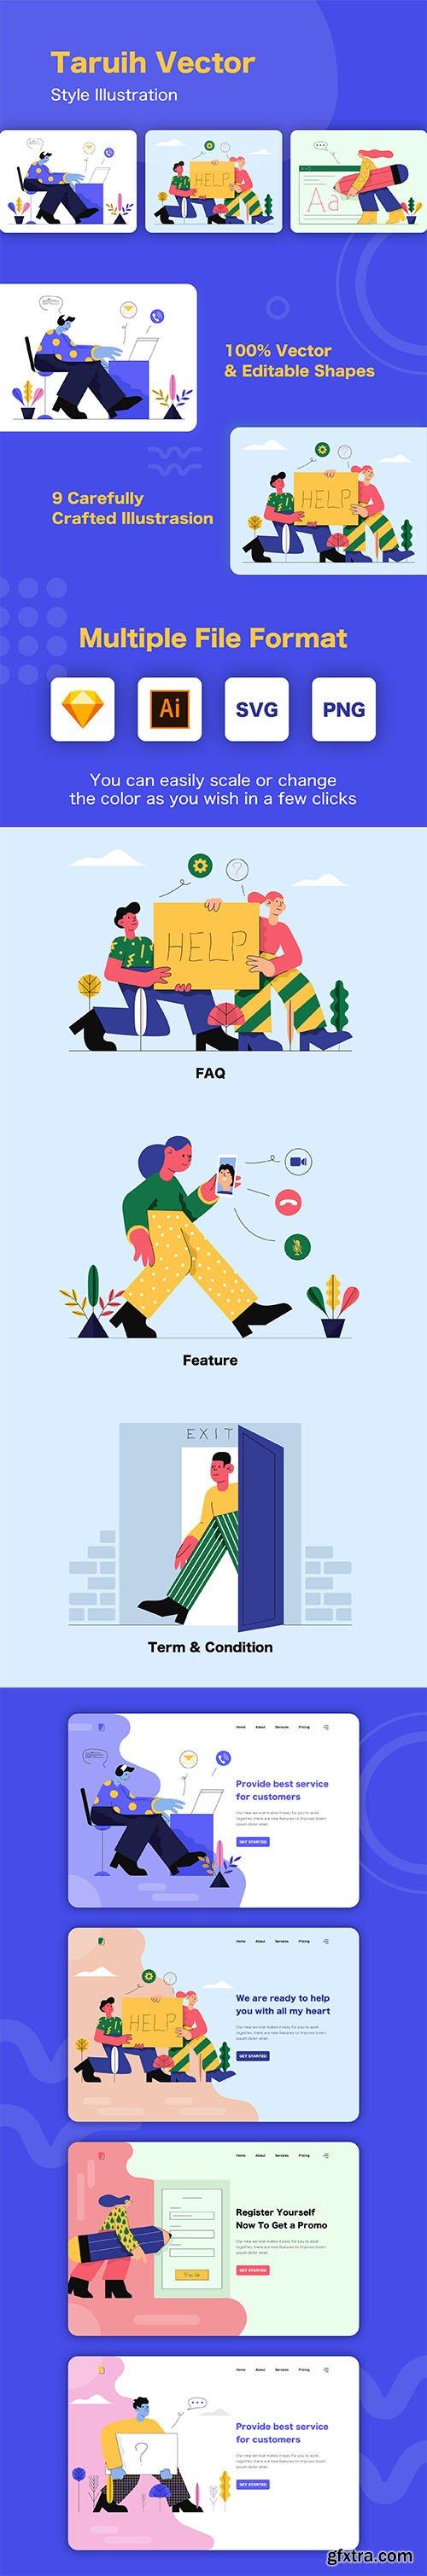 Taruih - Business Illustrations